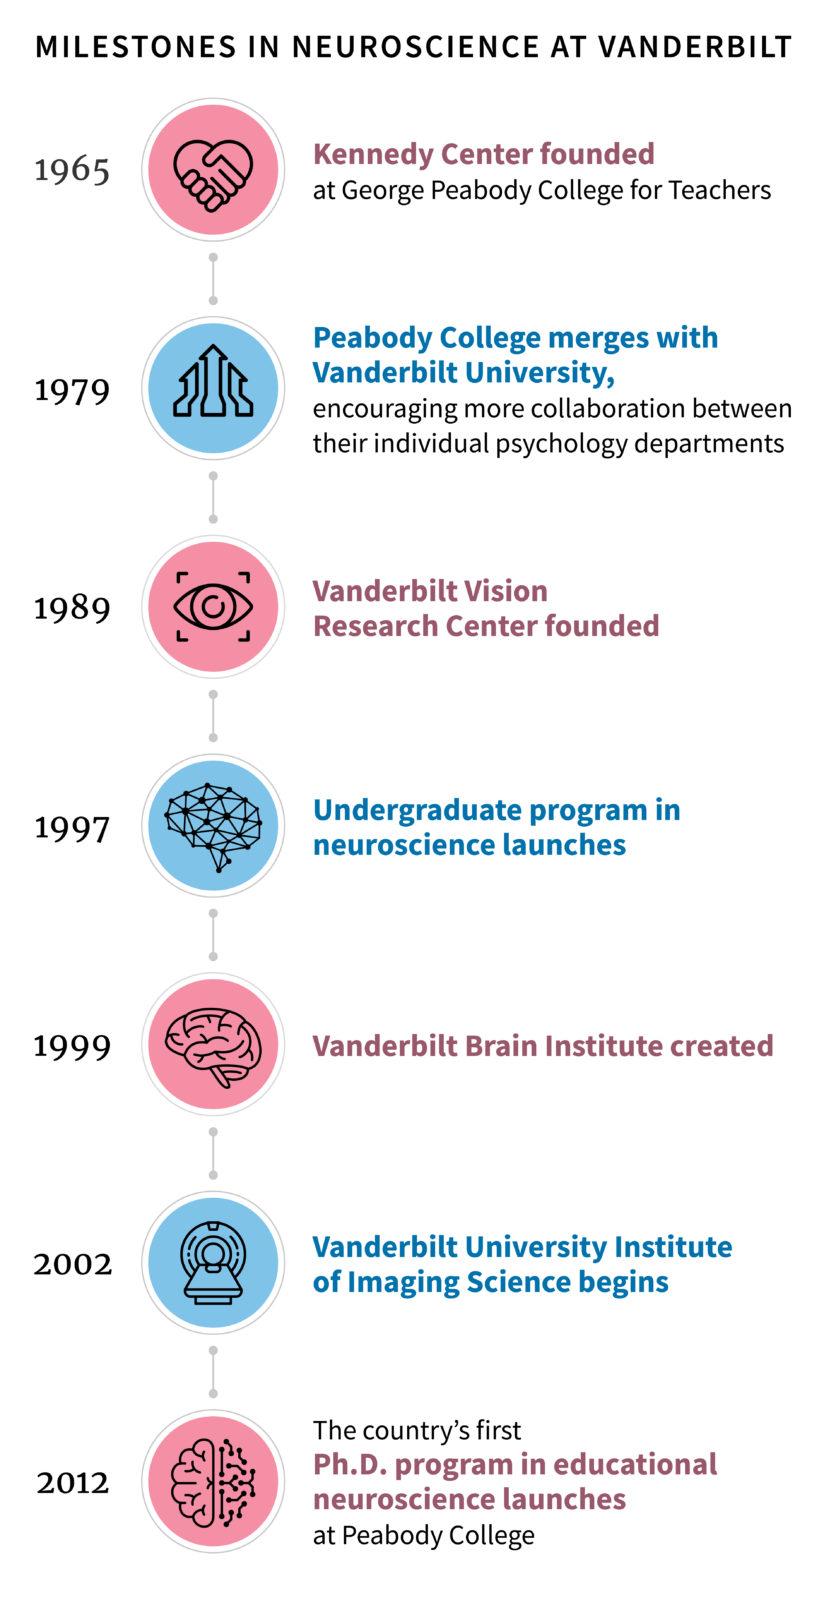 timeline showing milestones in neuroscience at Vanderbilt